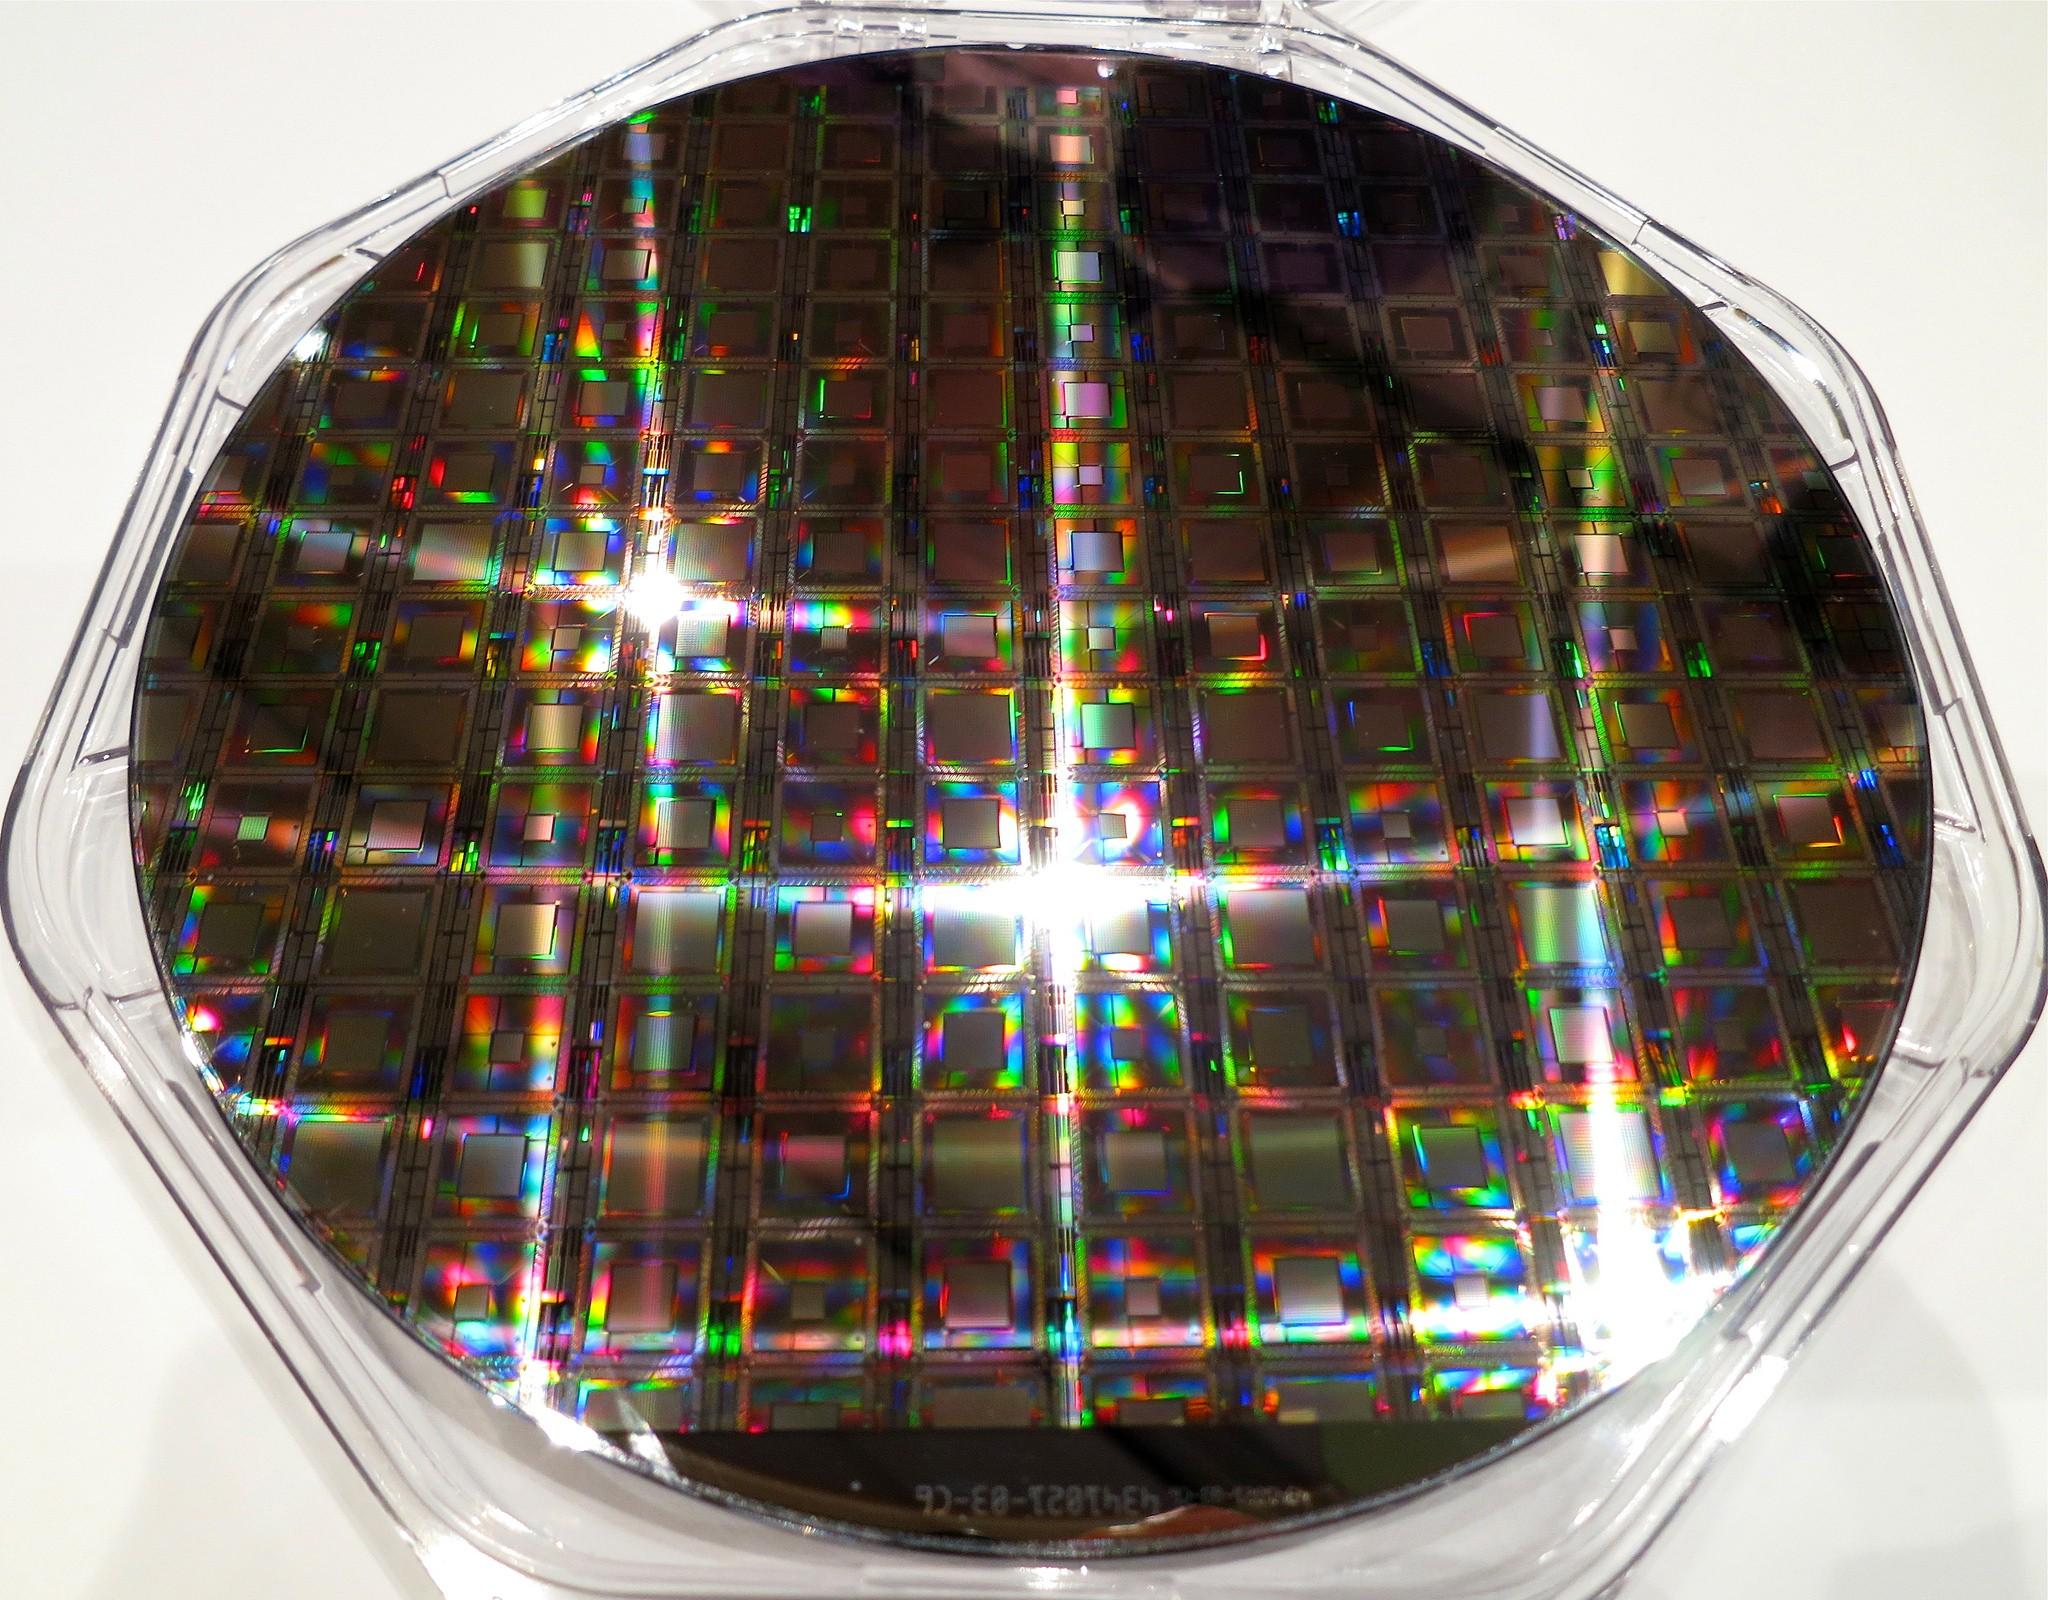 D-Wave 量子處理器。圖片來源:Steve Jurvetson@flickr, by CC 2.0